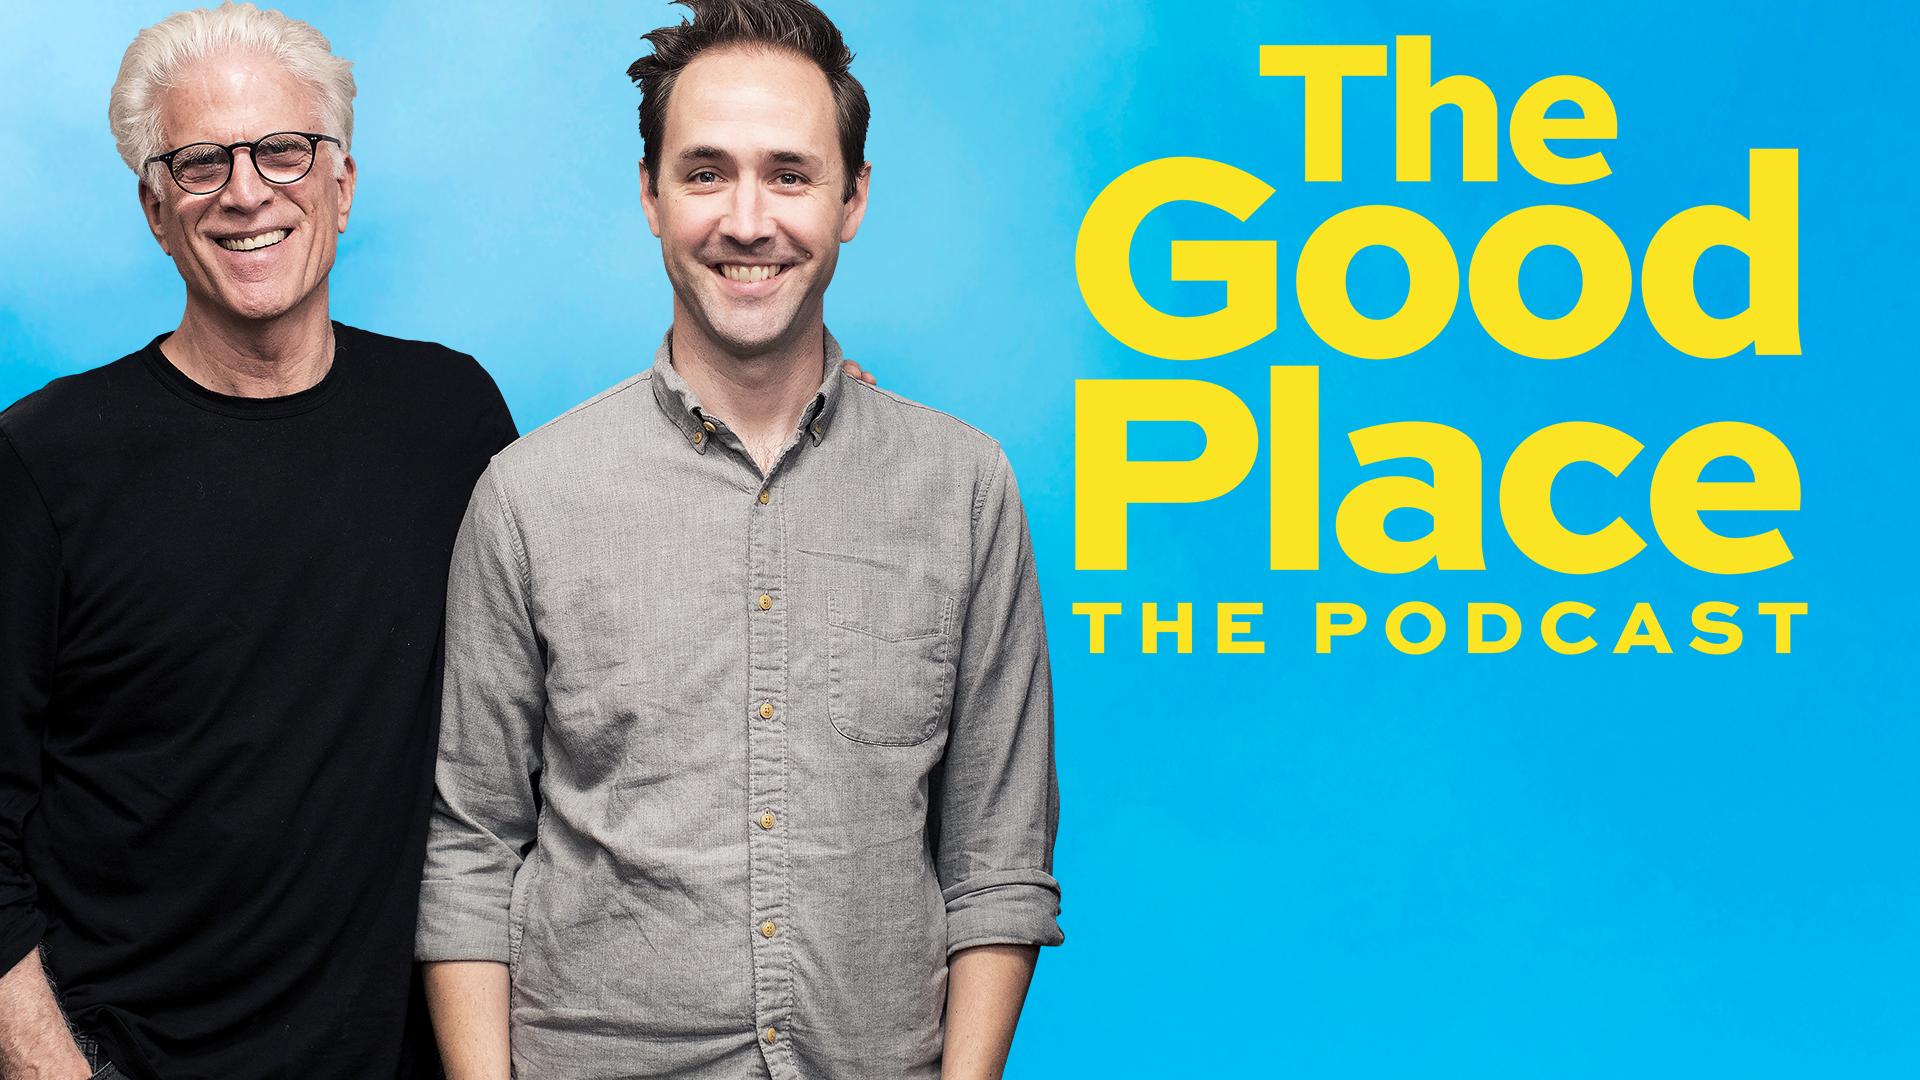 the good place season 2 subtitles download